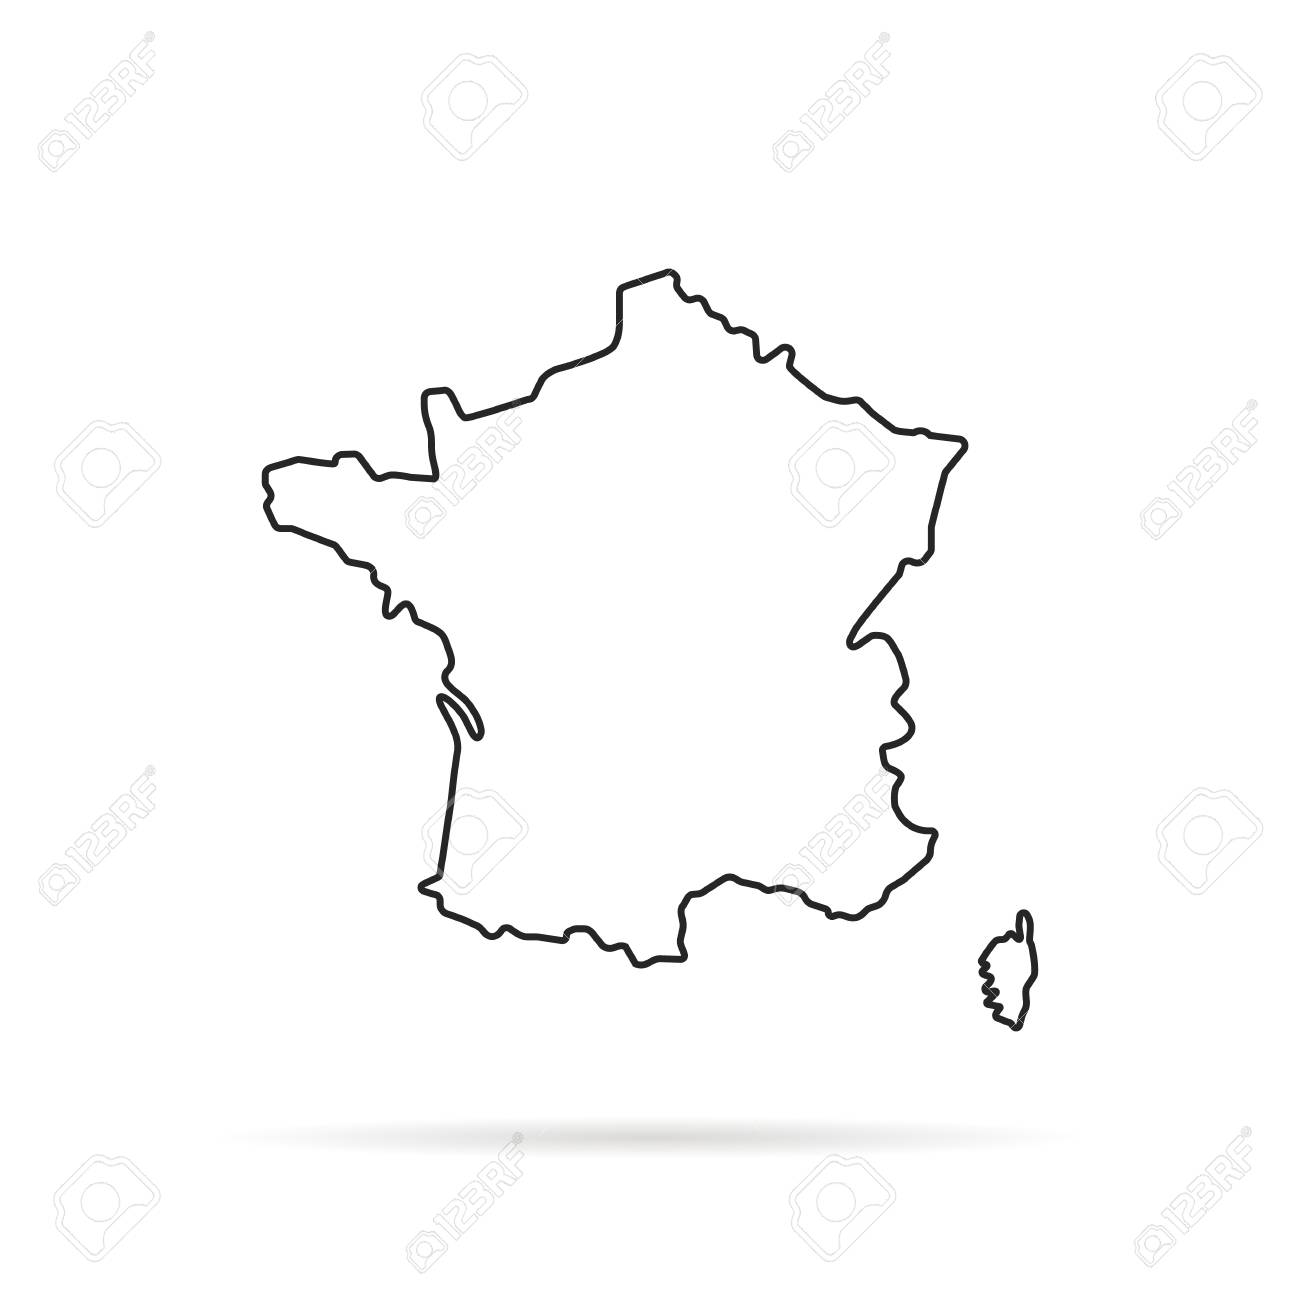 Outline Of Map Of France.Black Outline Hand Drawn Map Of France